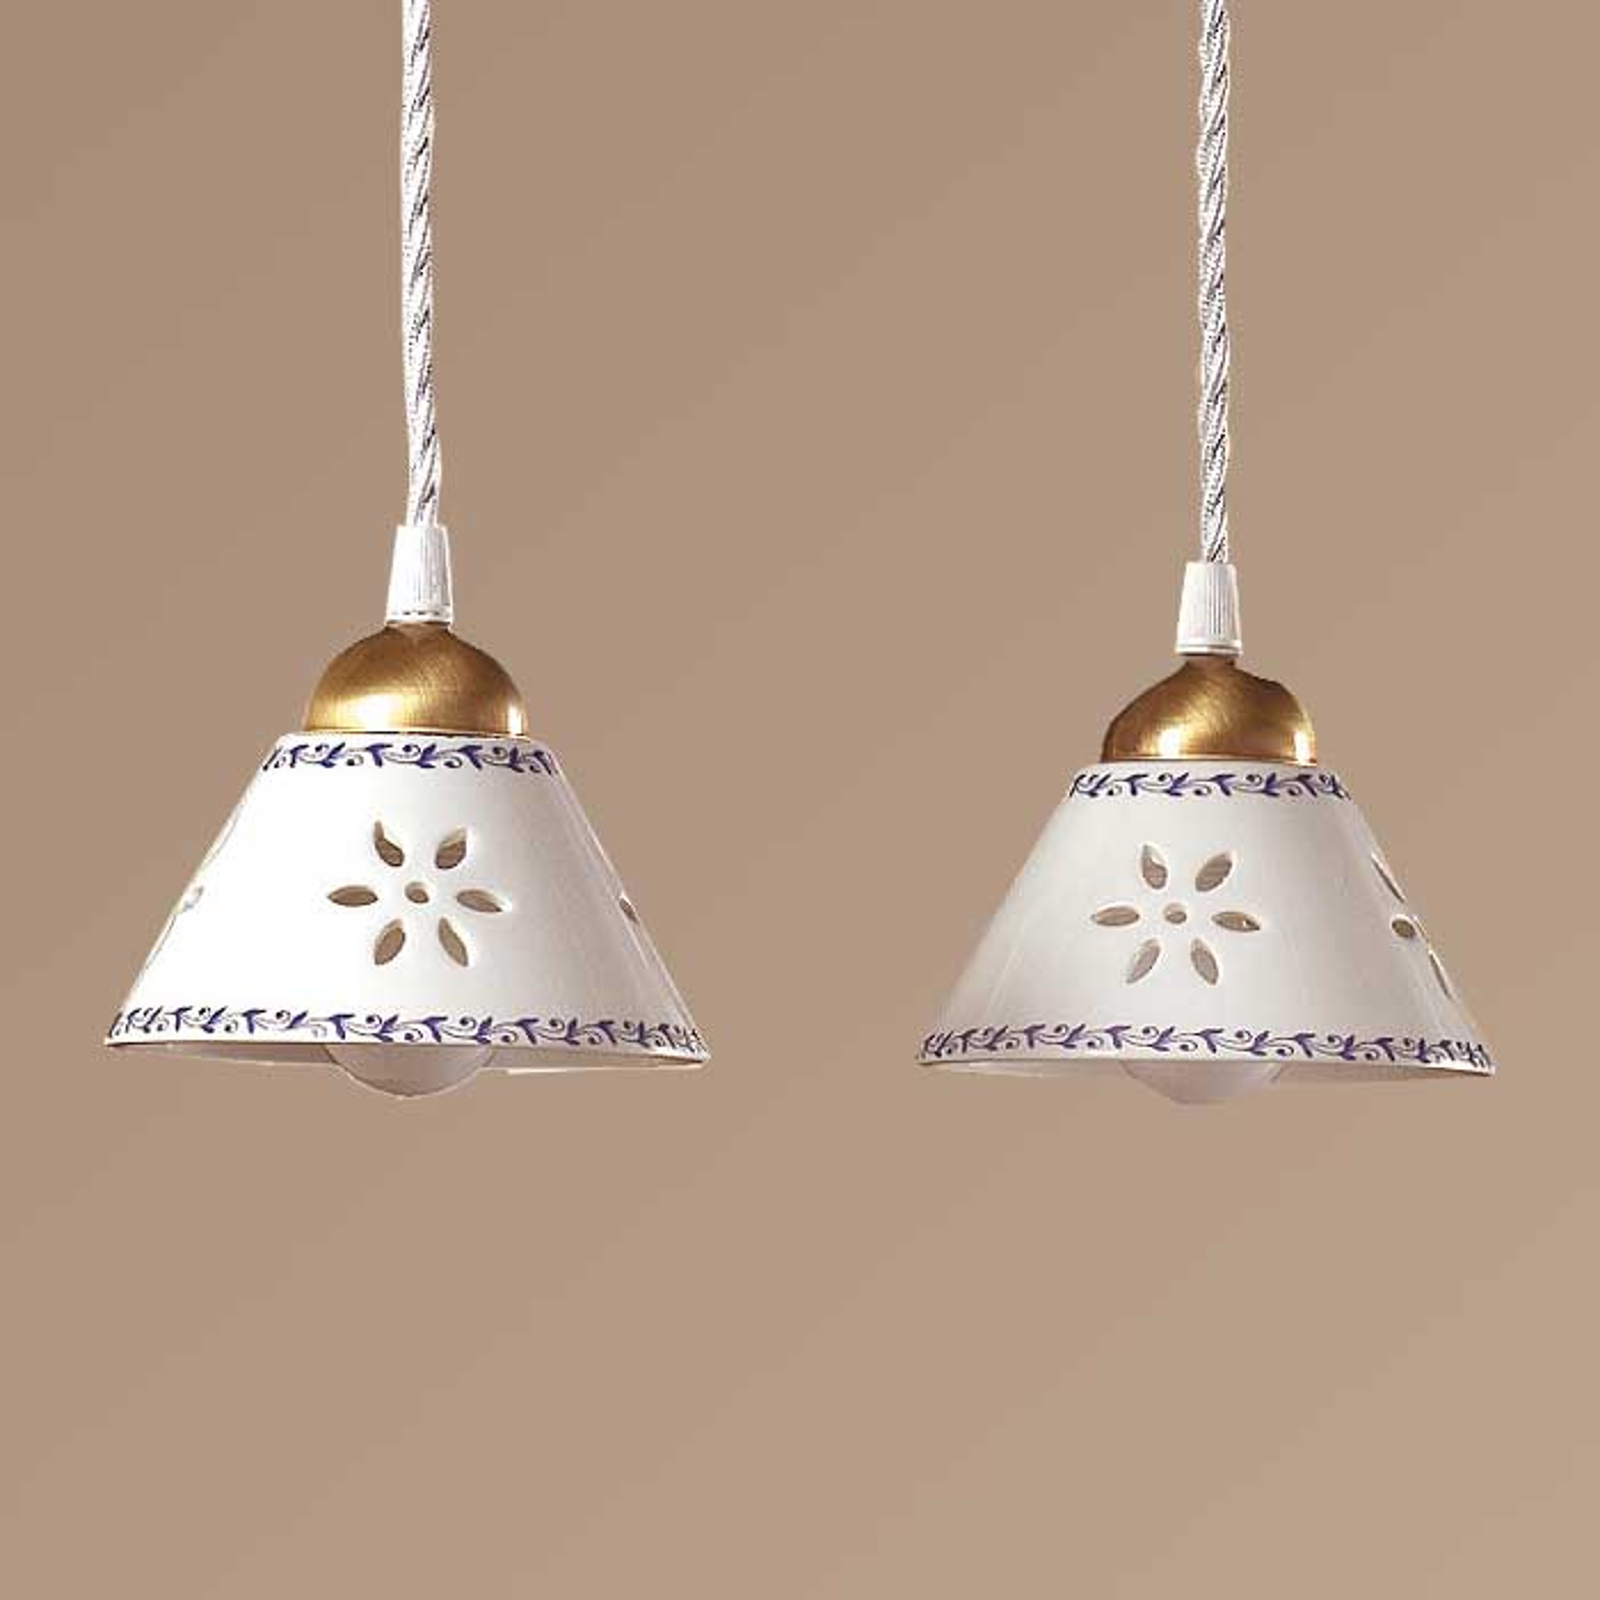 Suspension 2 lampes NONNA en céramique blanche